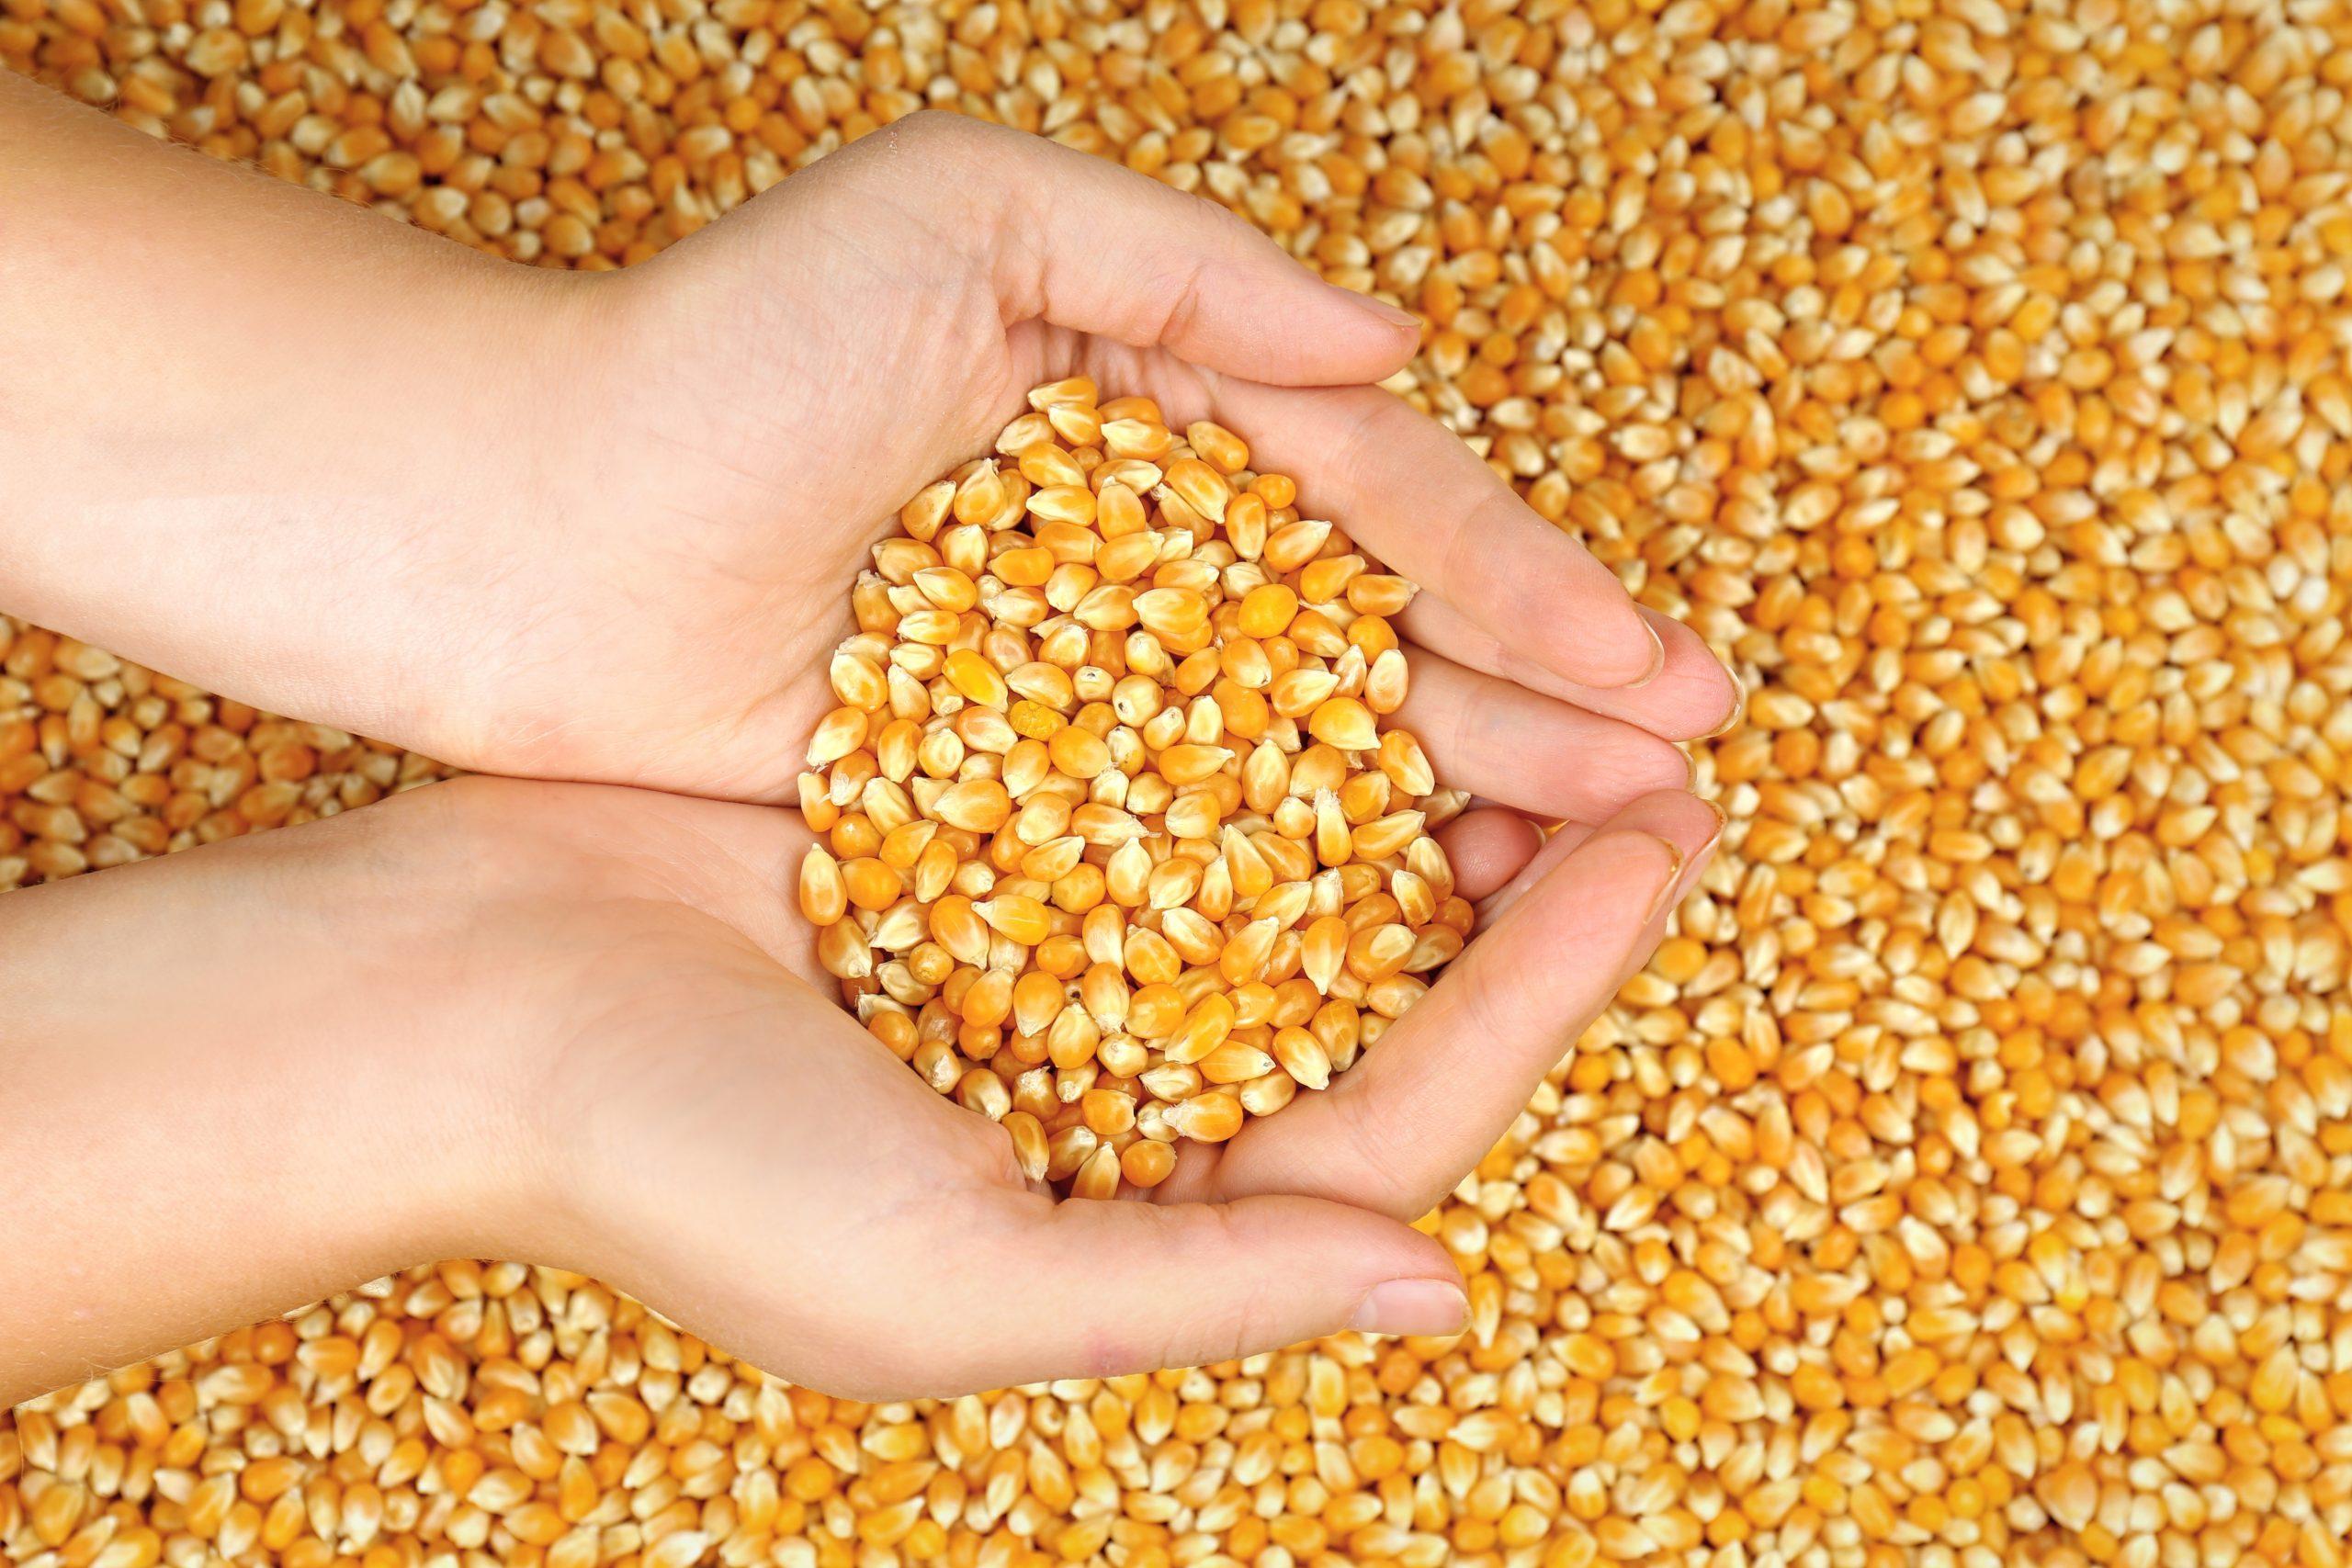 Hand holding corn seeds